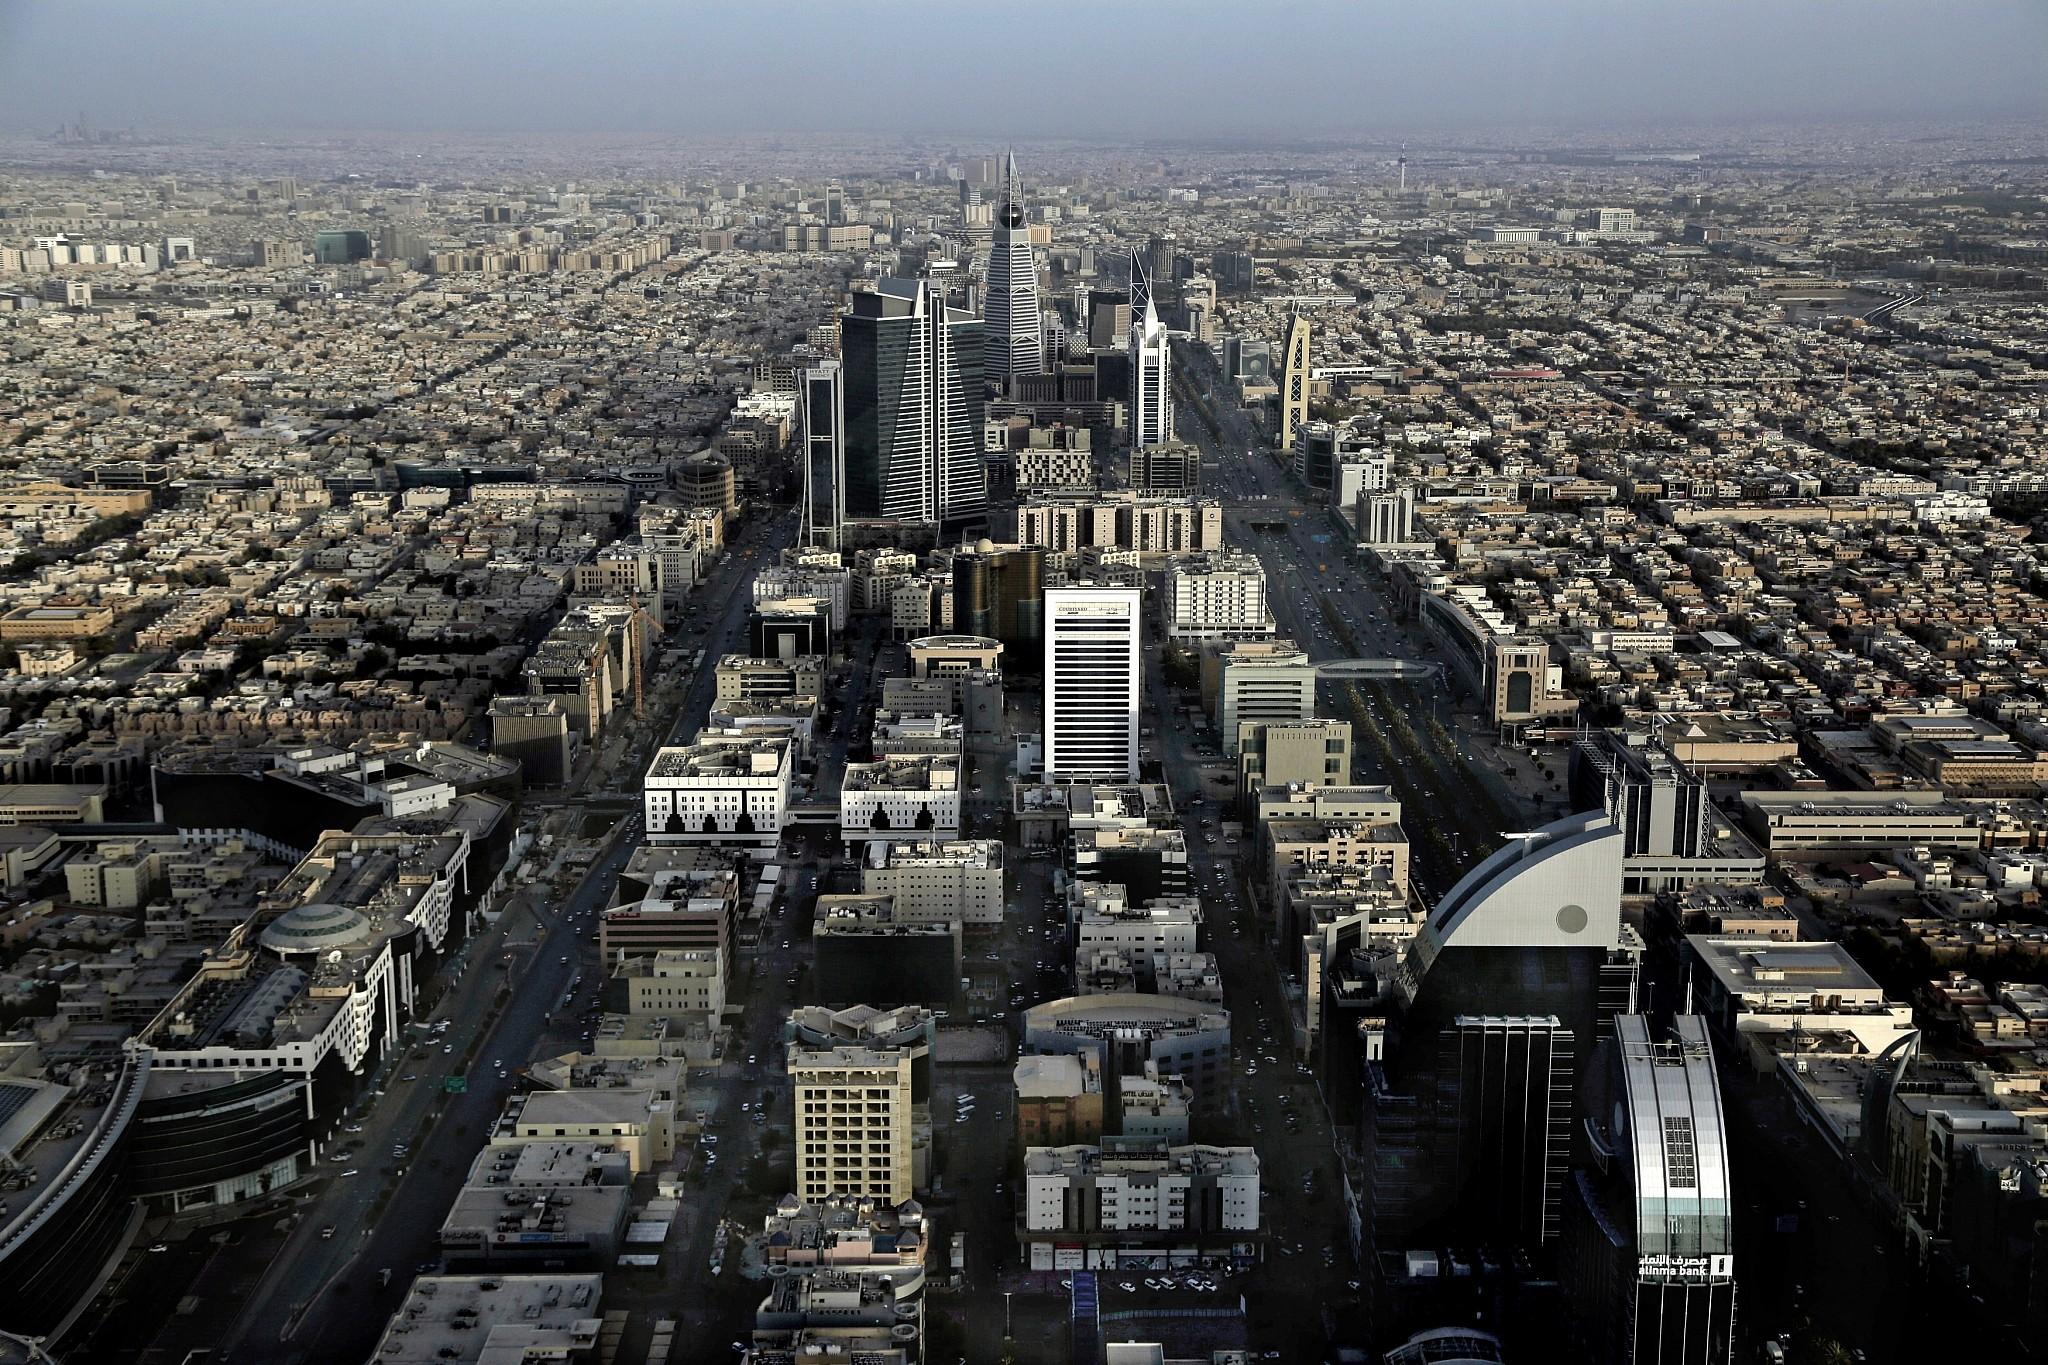 Saudi Arabia intercepts 'hostile target' over Riyadh